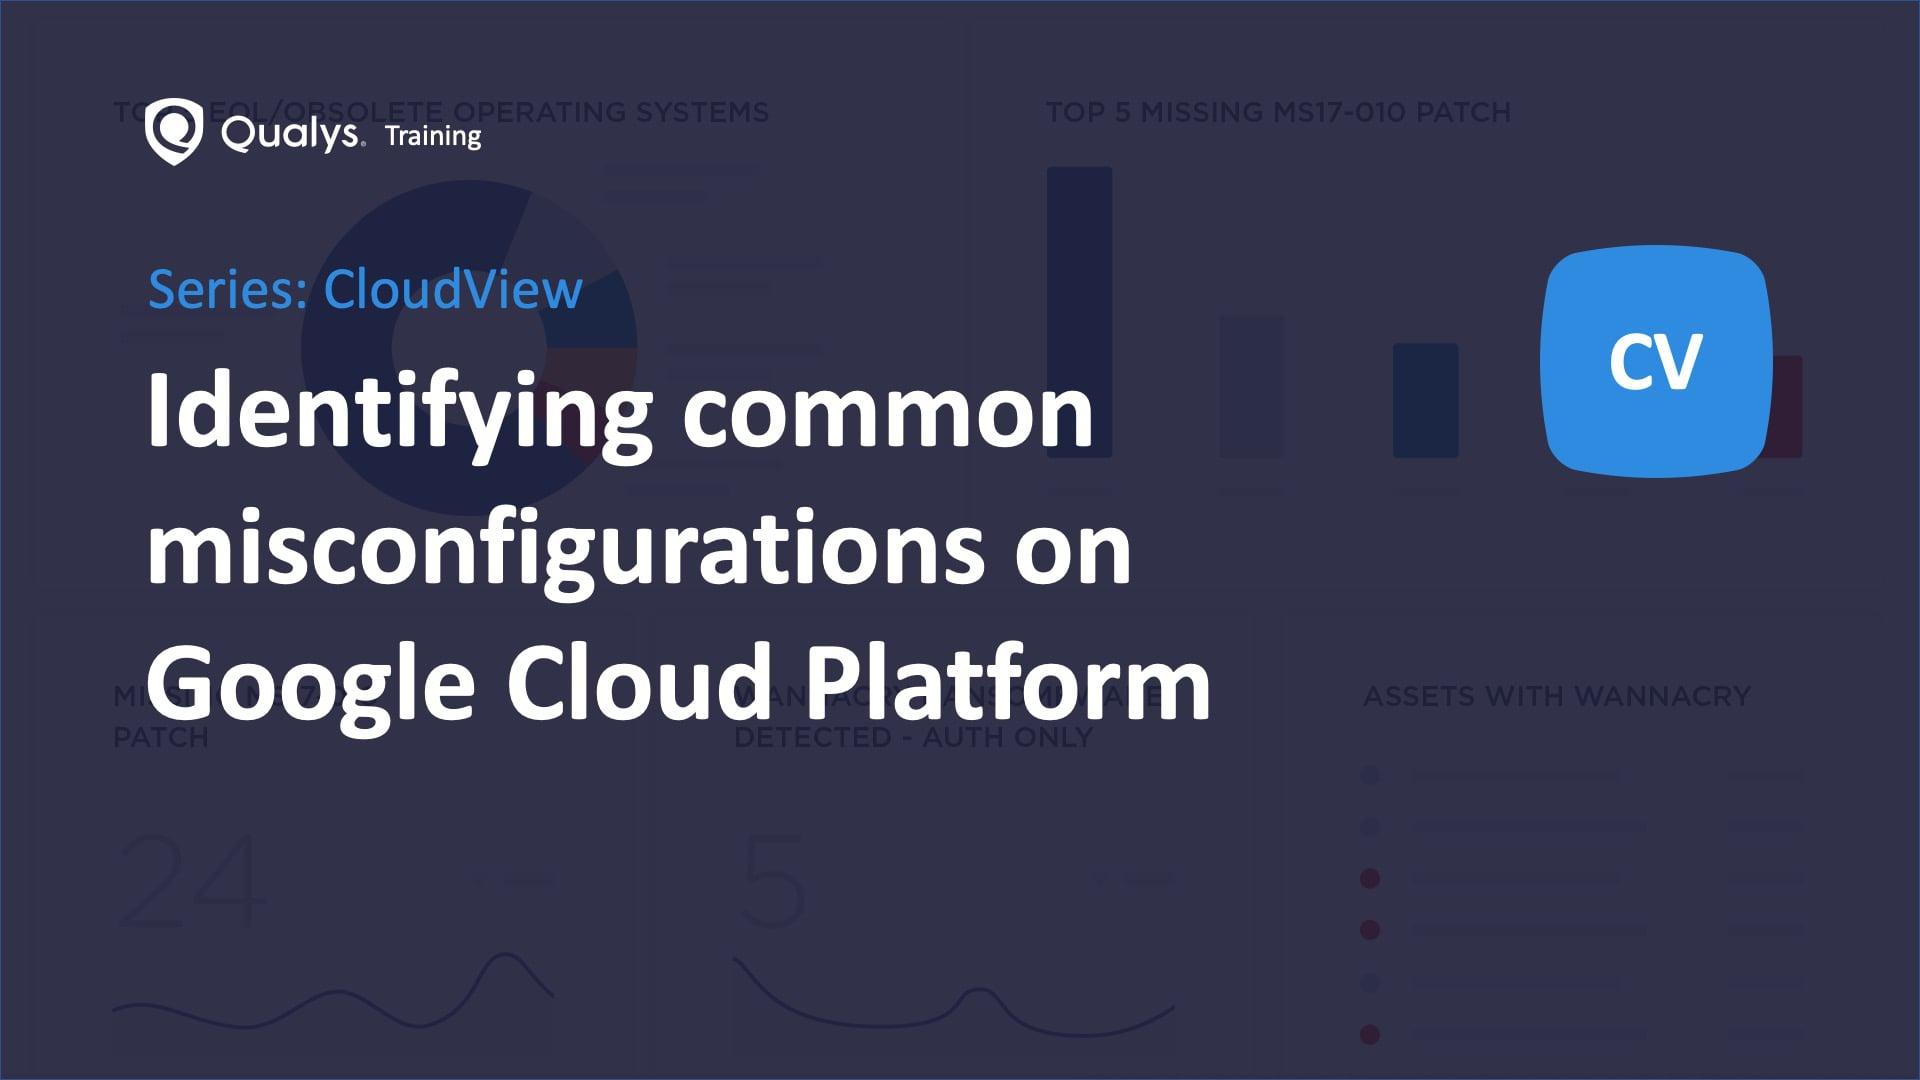 Identifying common misconfigurations on Google Cloud Platform